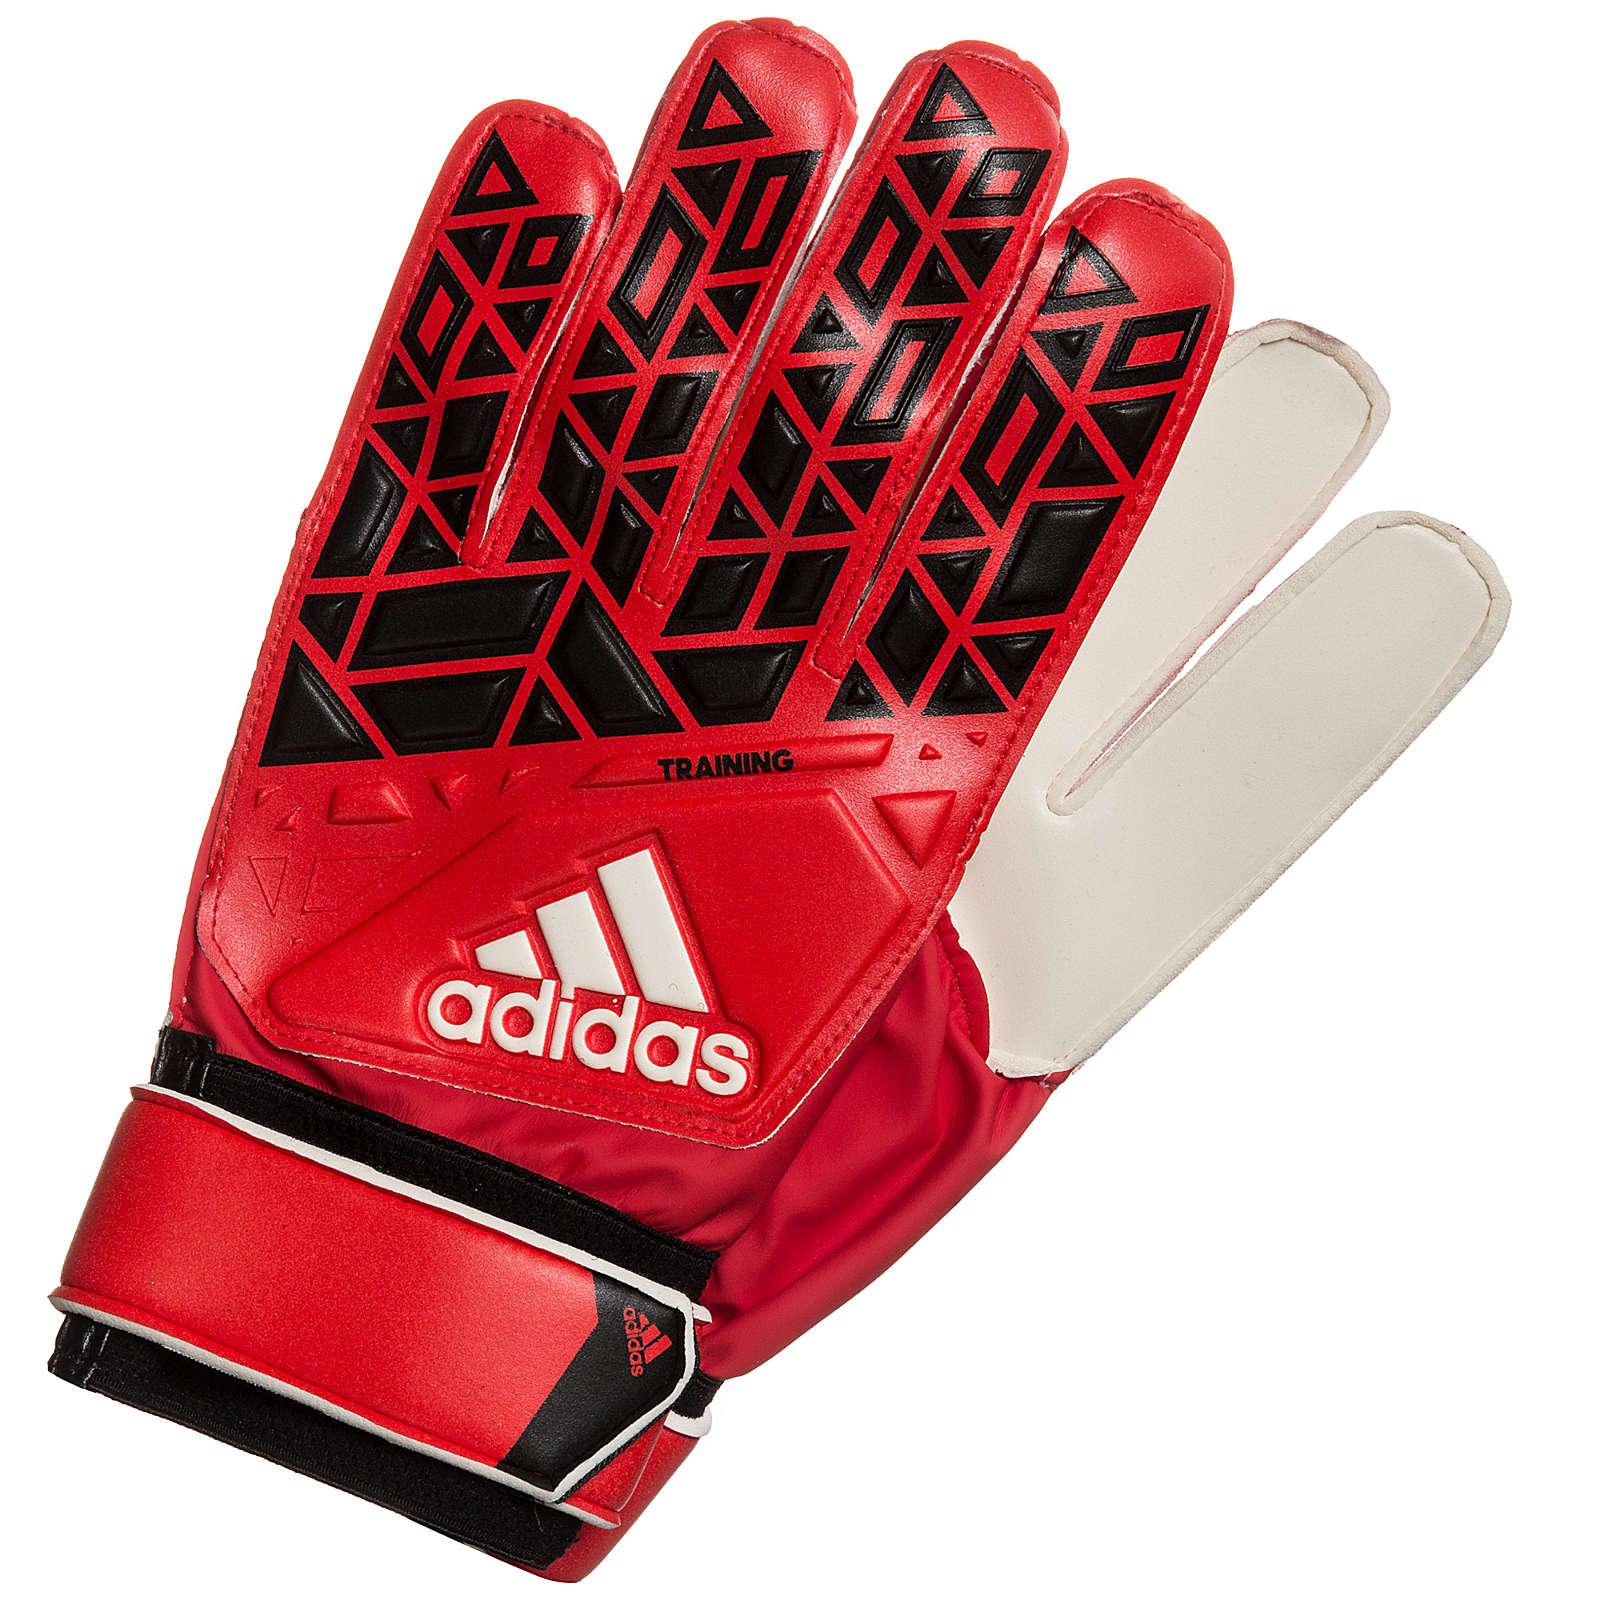 adidas Performance adidas ACE Training Torwarthandschuh Herren rot Herren Gr. 9